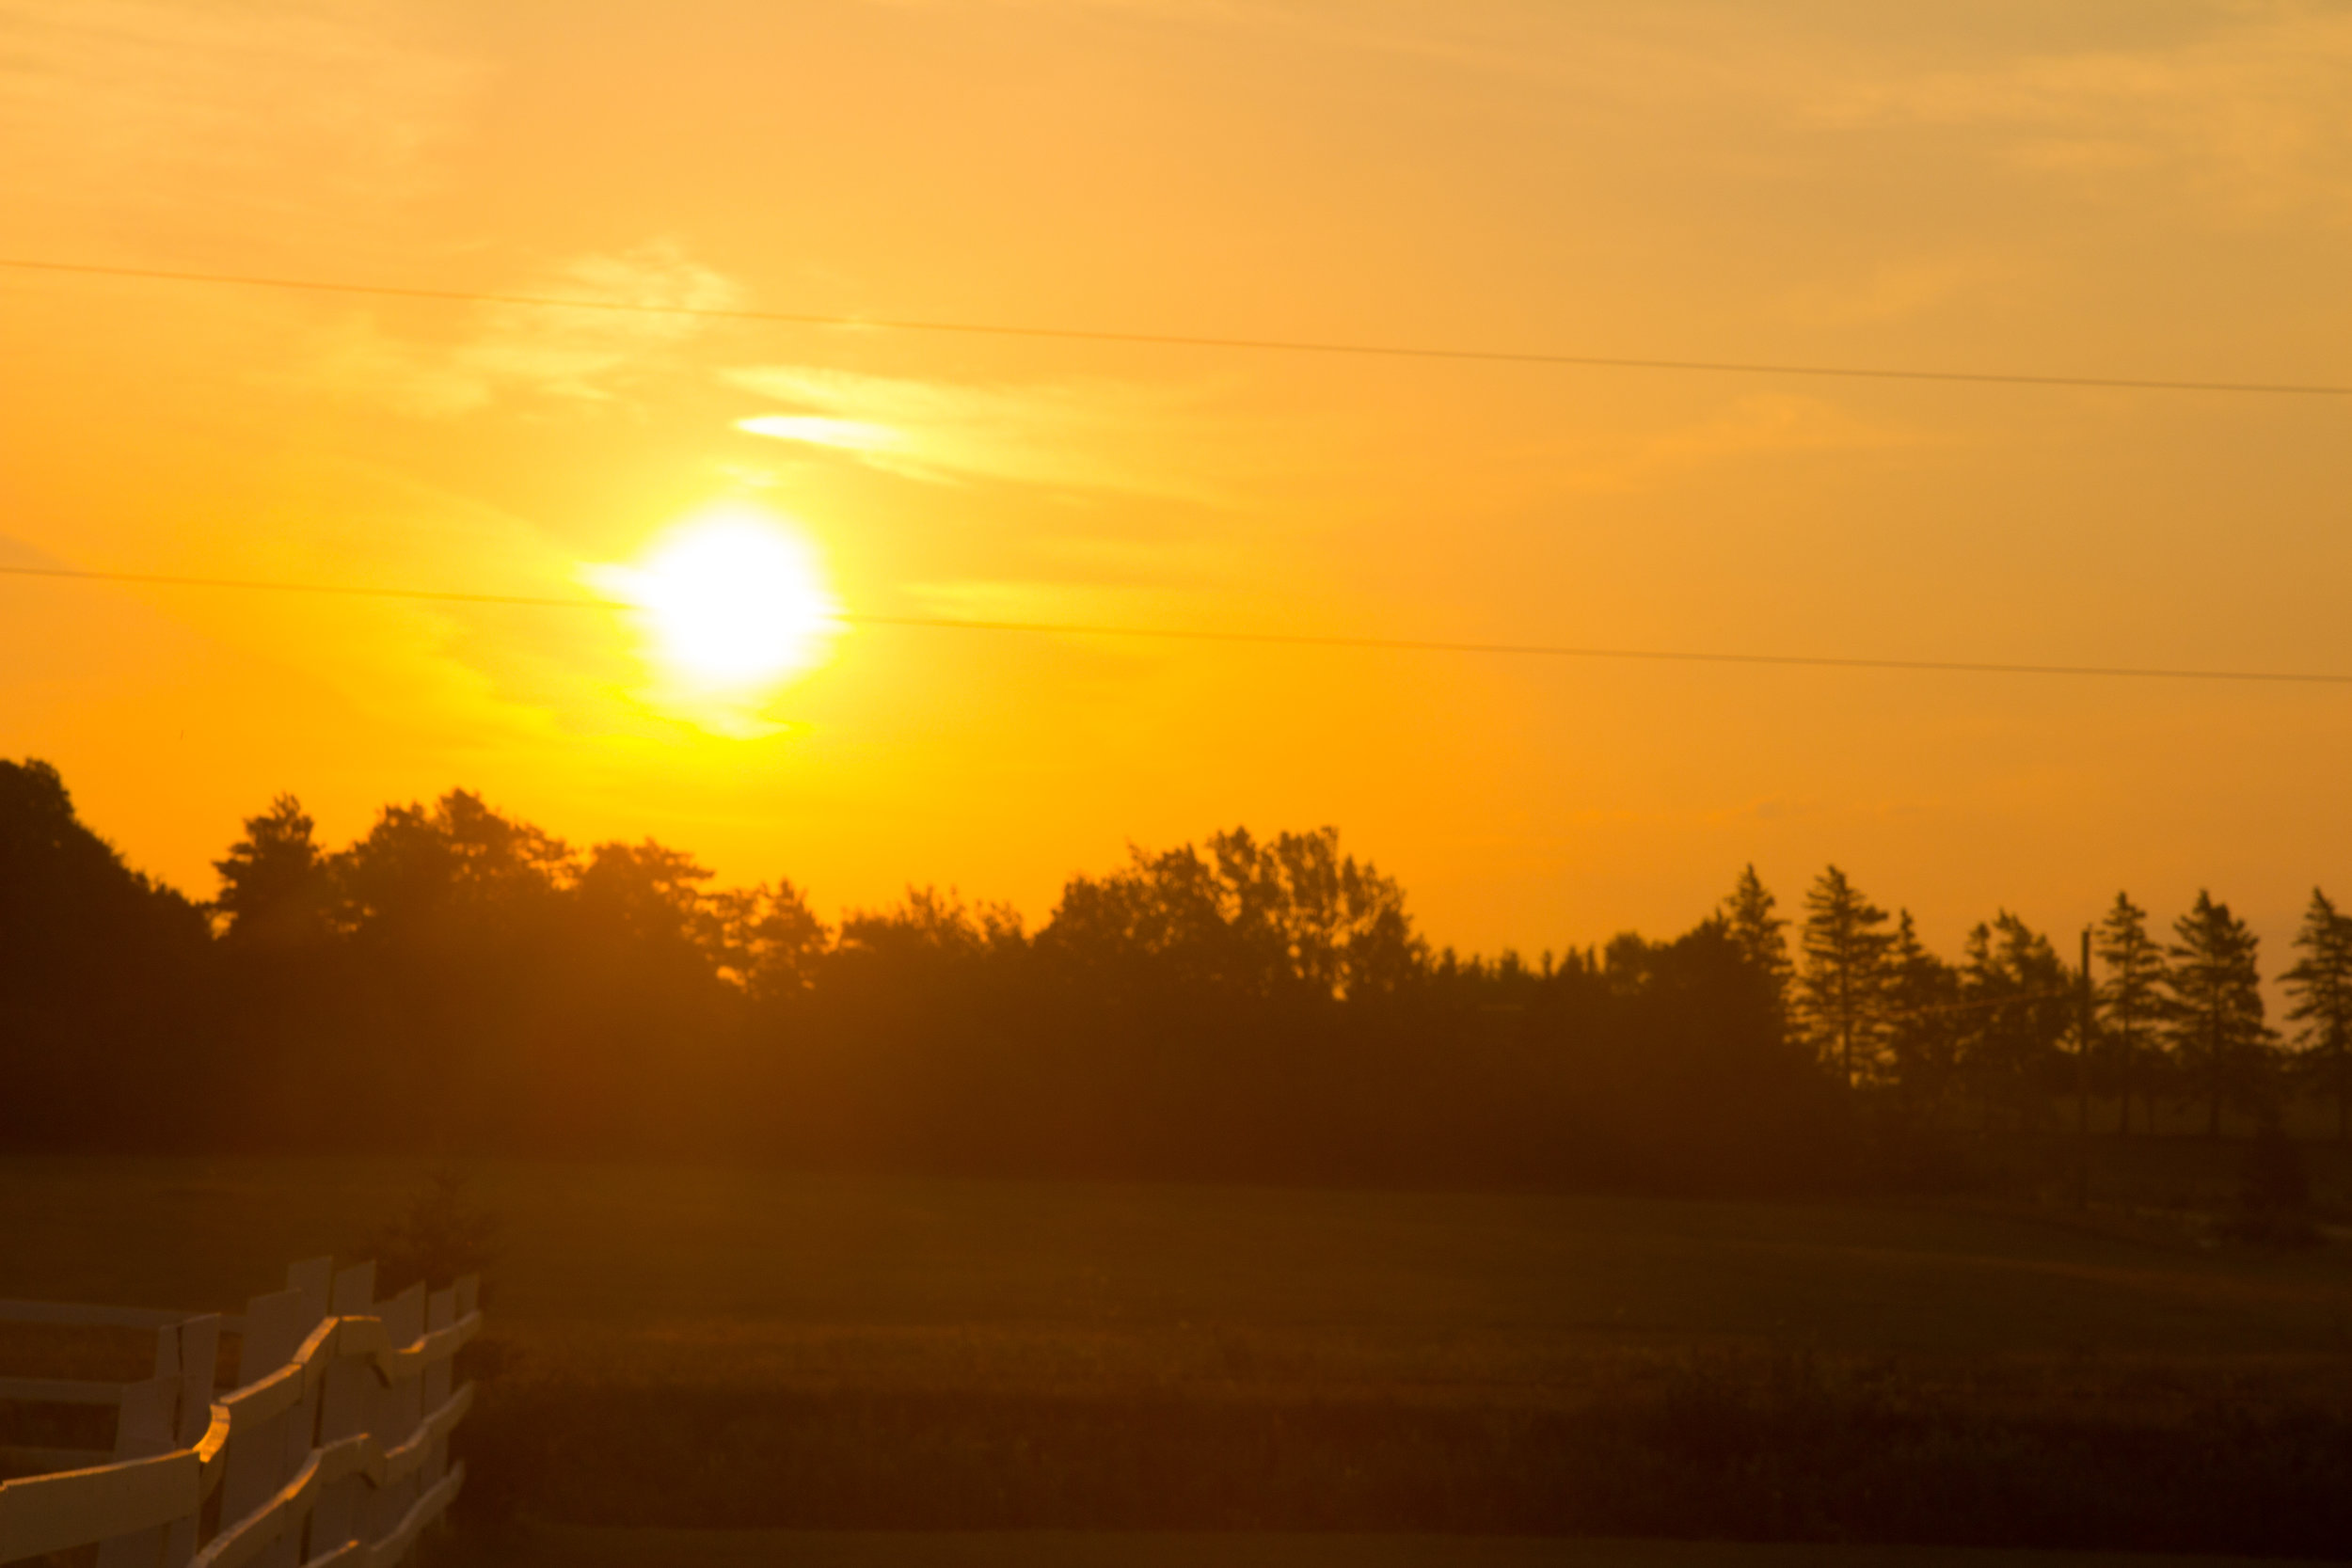 Sunrise in Prince Edward Island